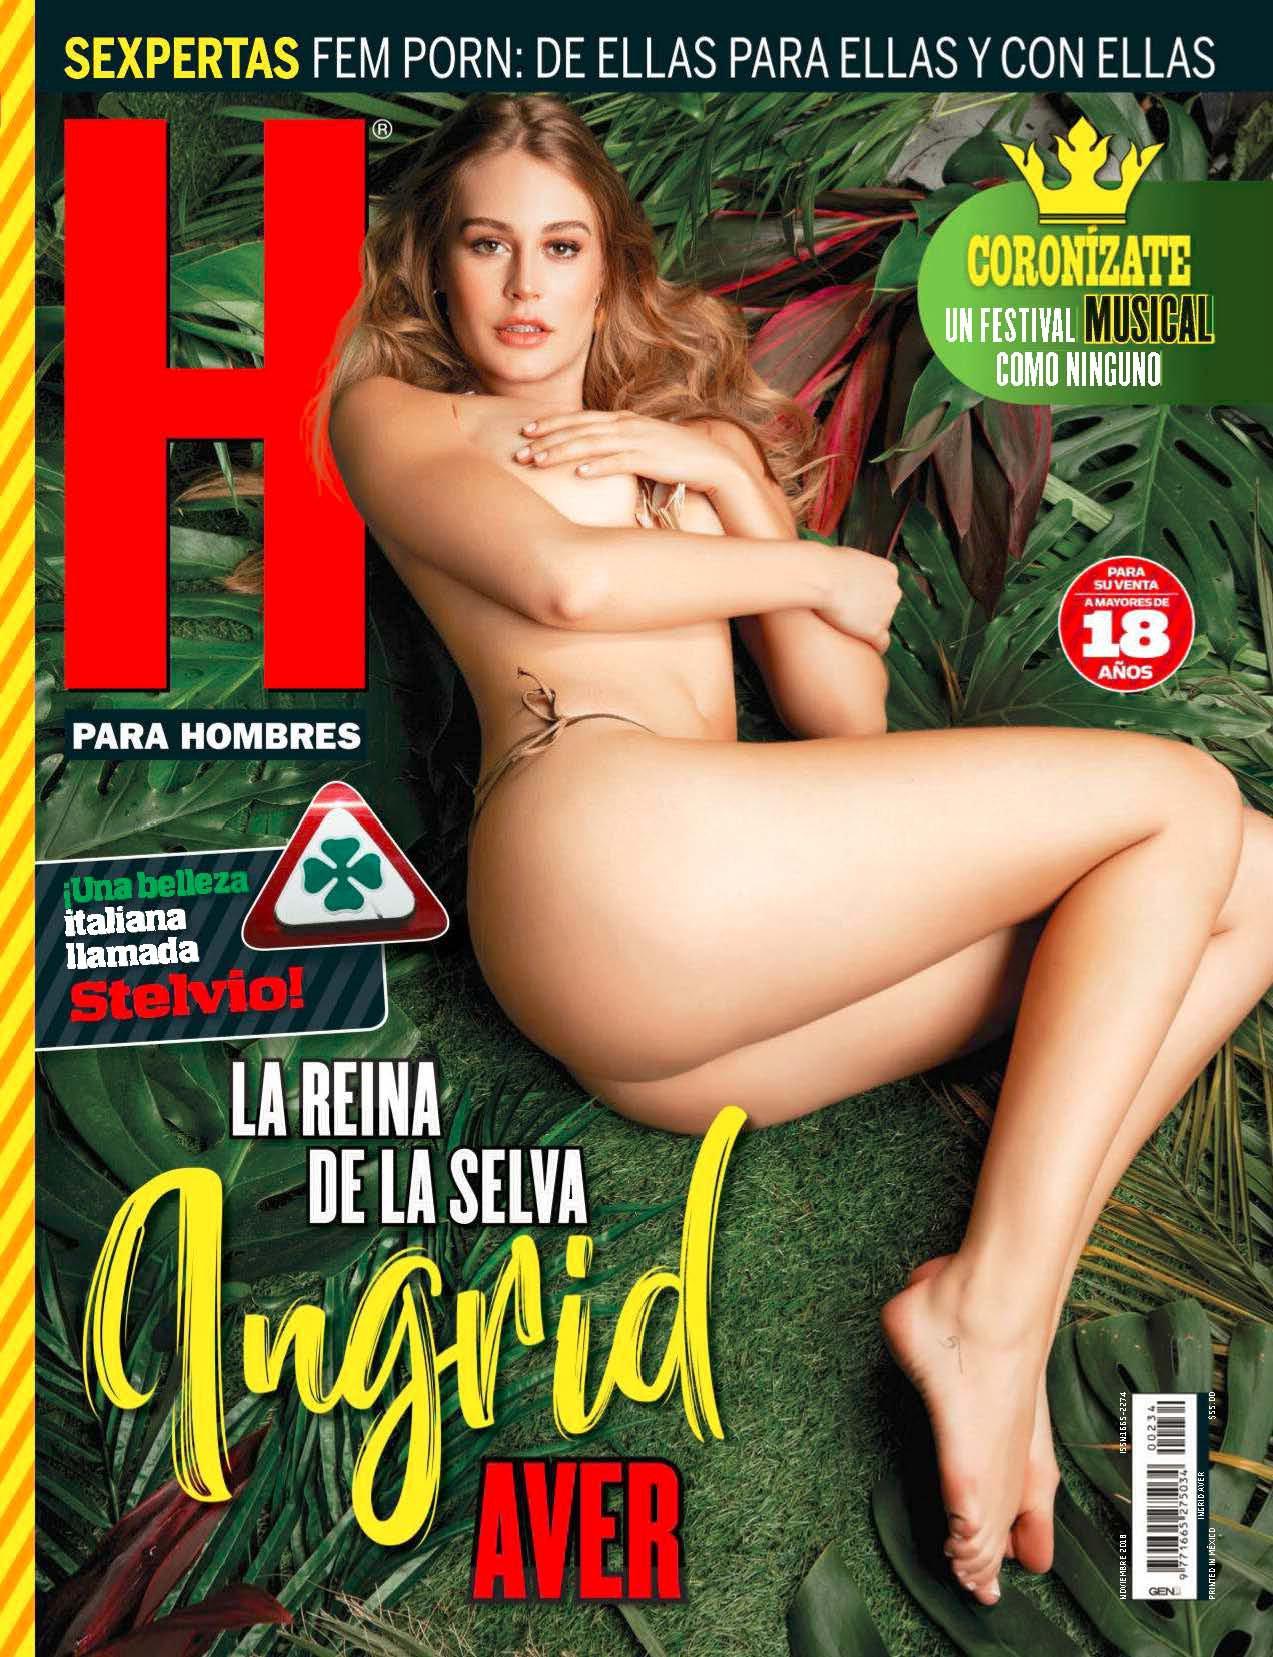 Ingrid miami naked